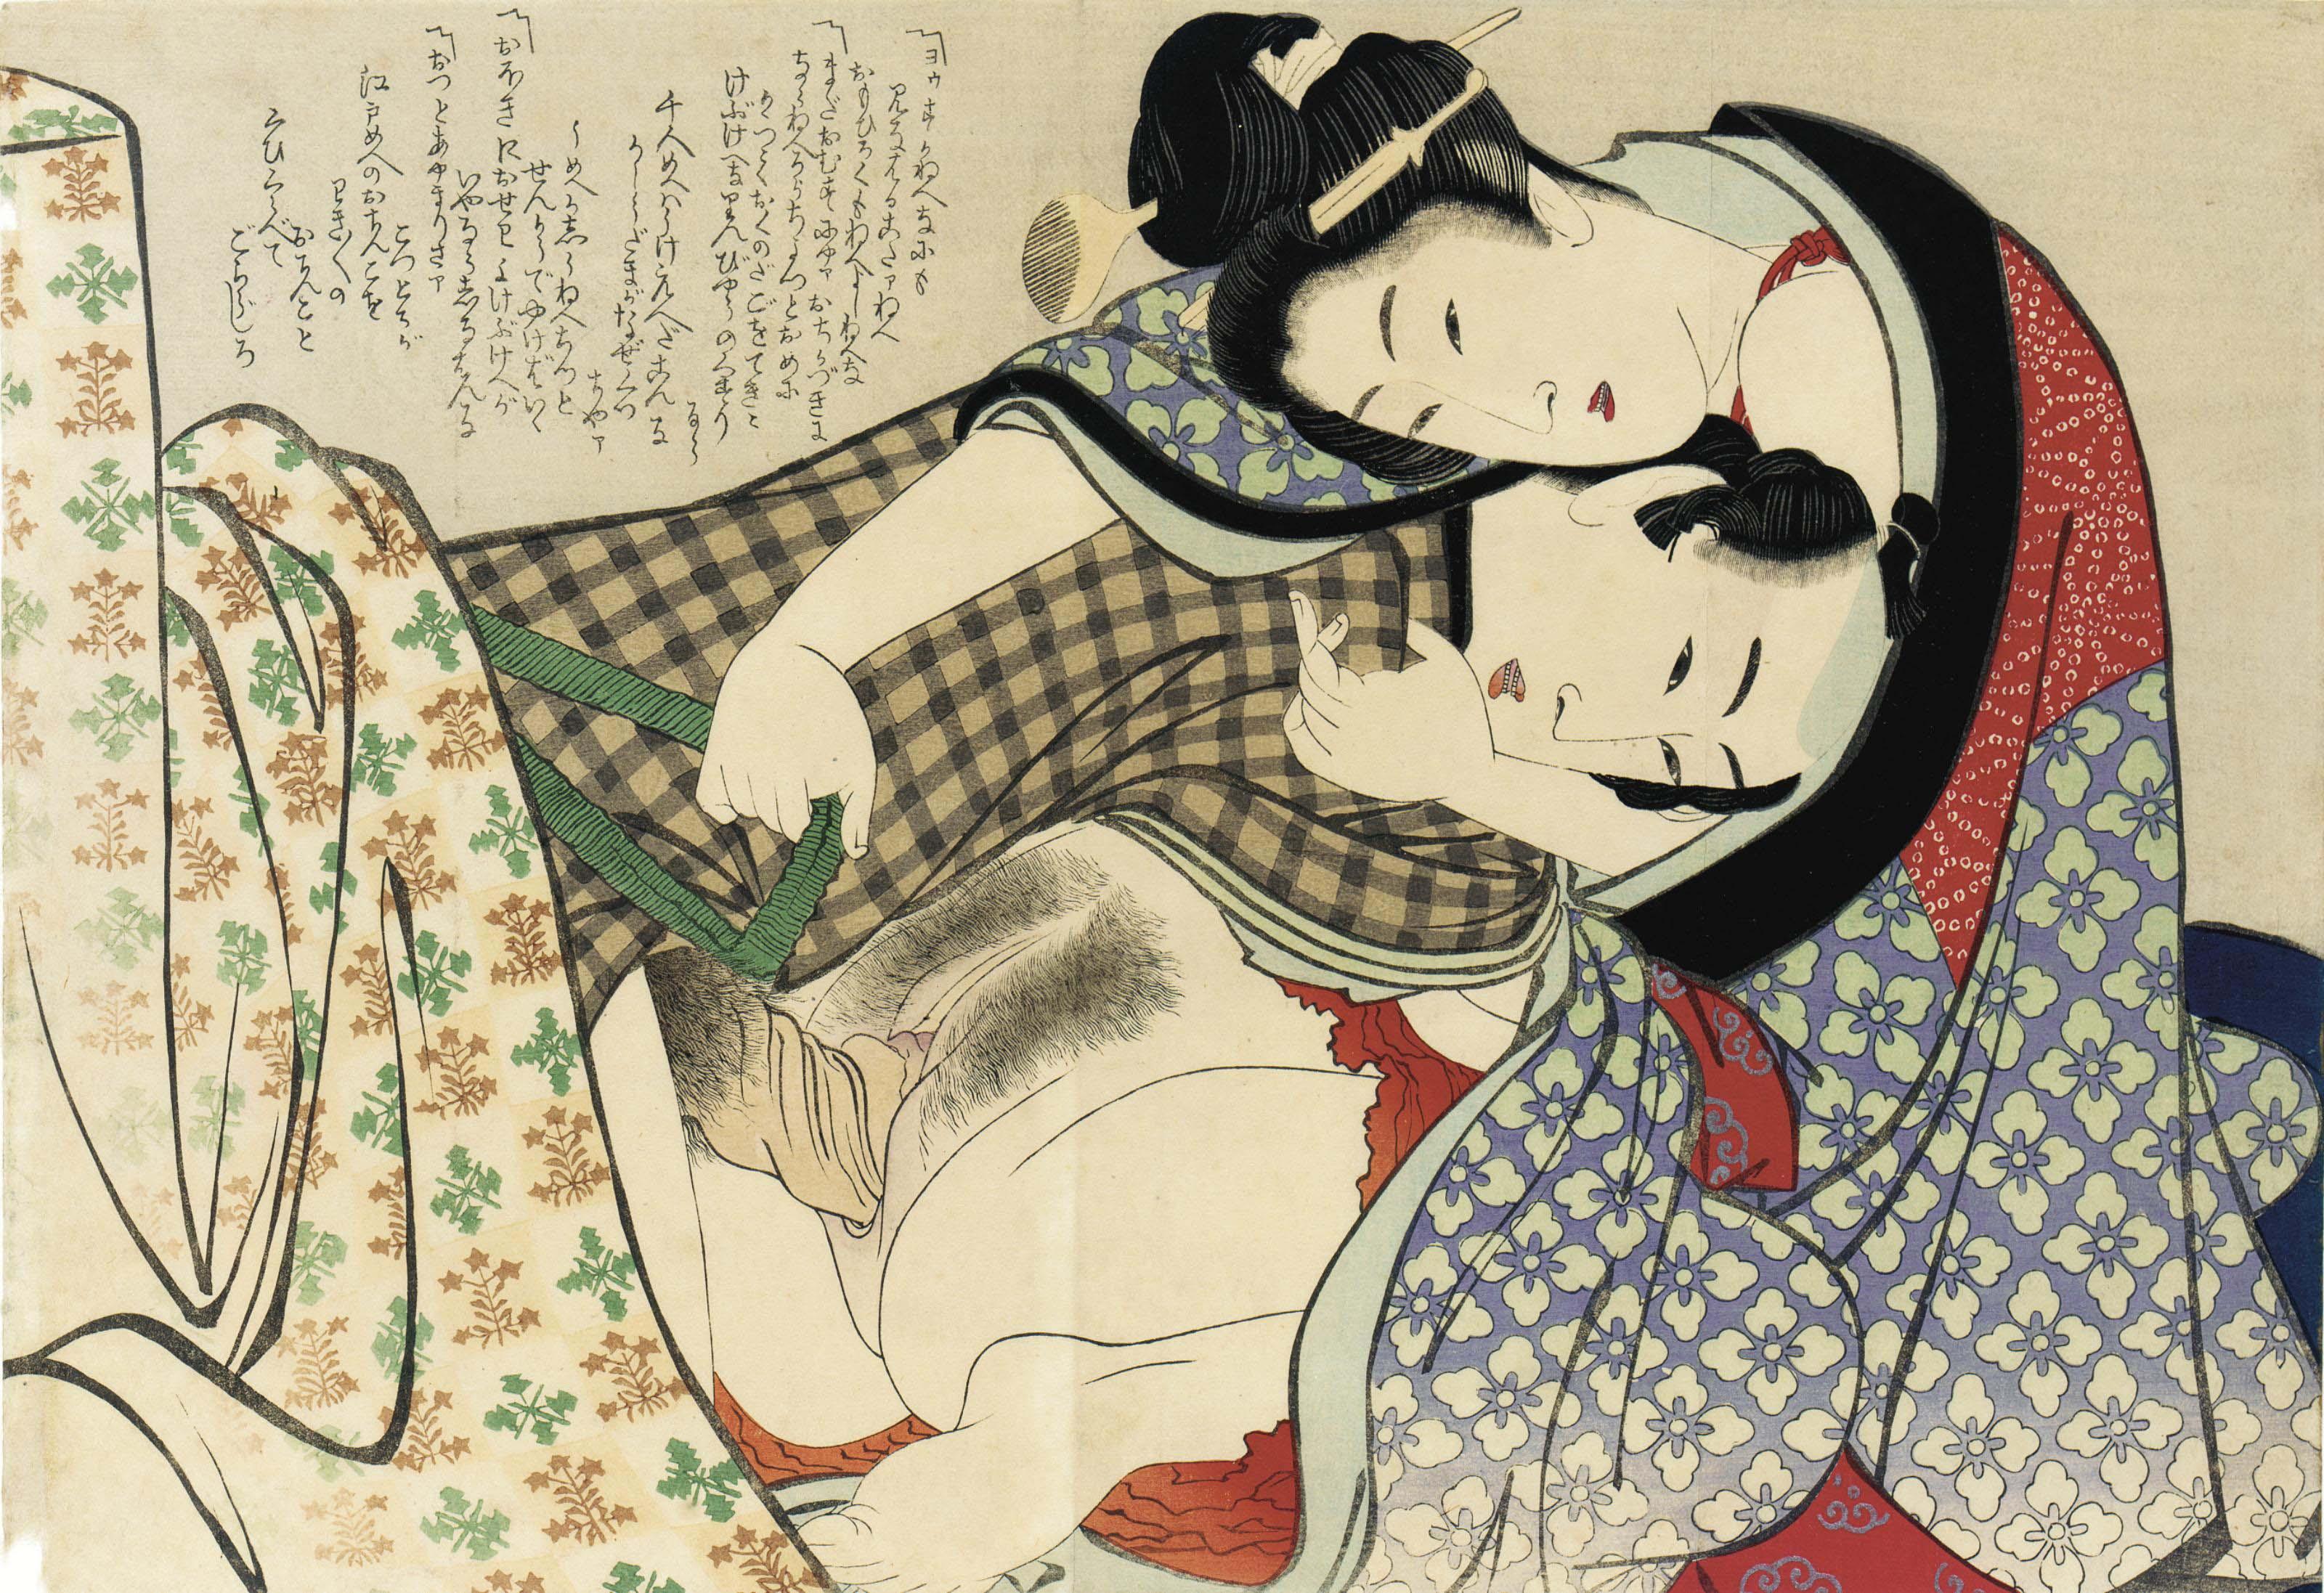 Idea erotica japan prints opinion